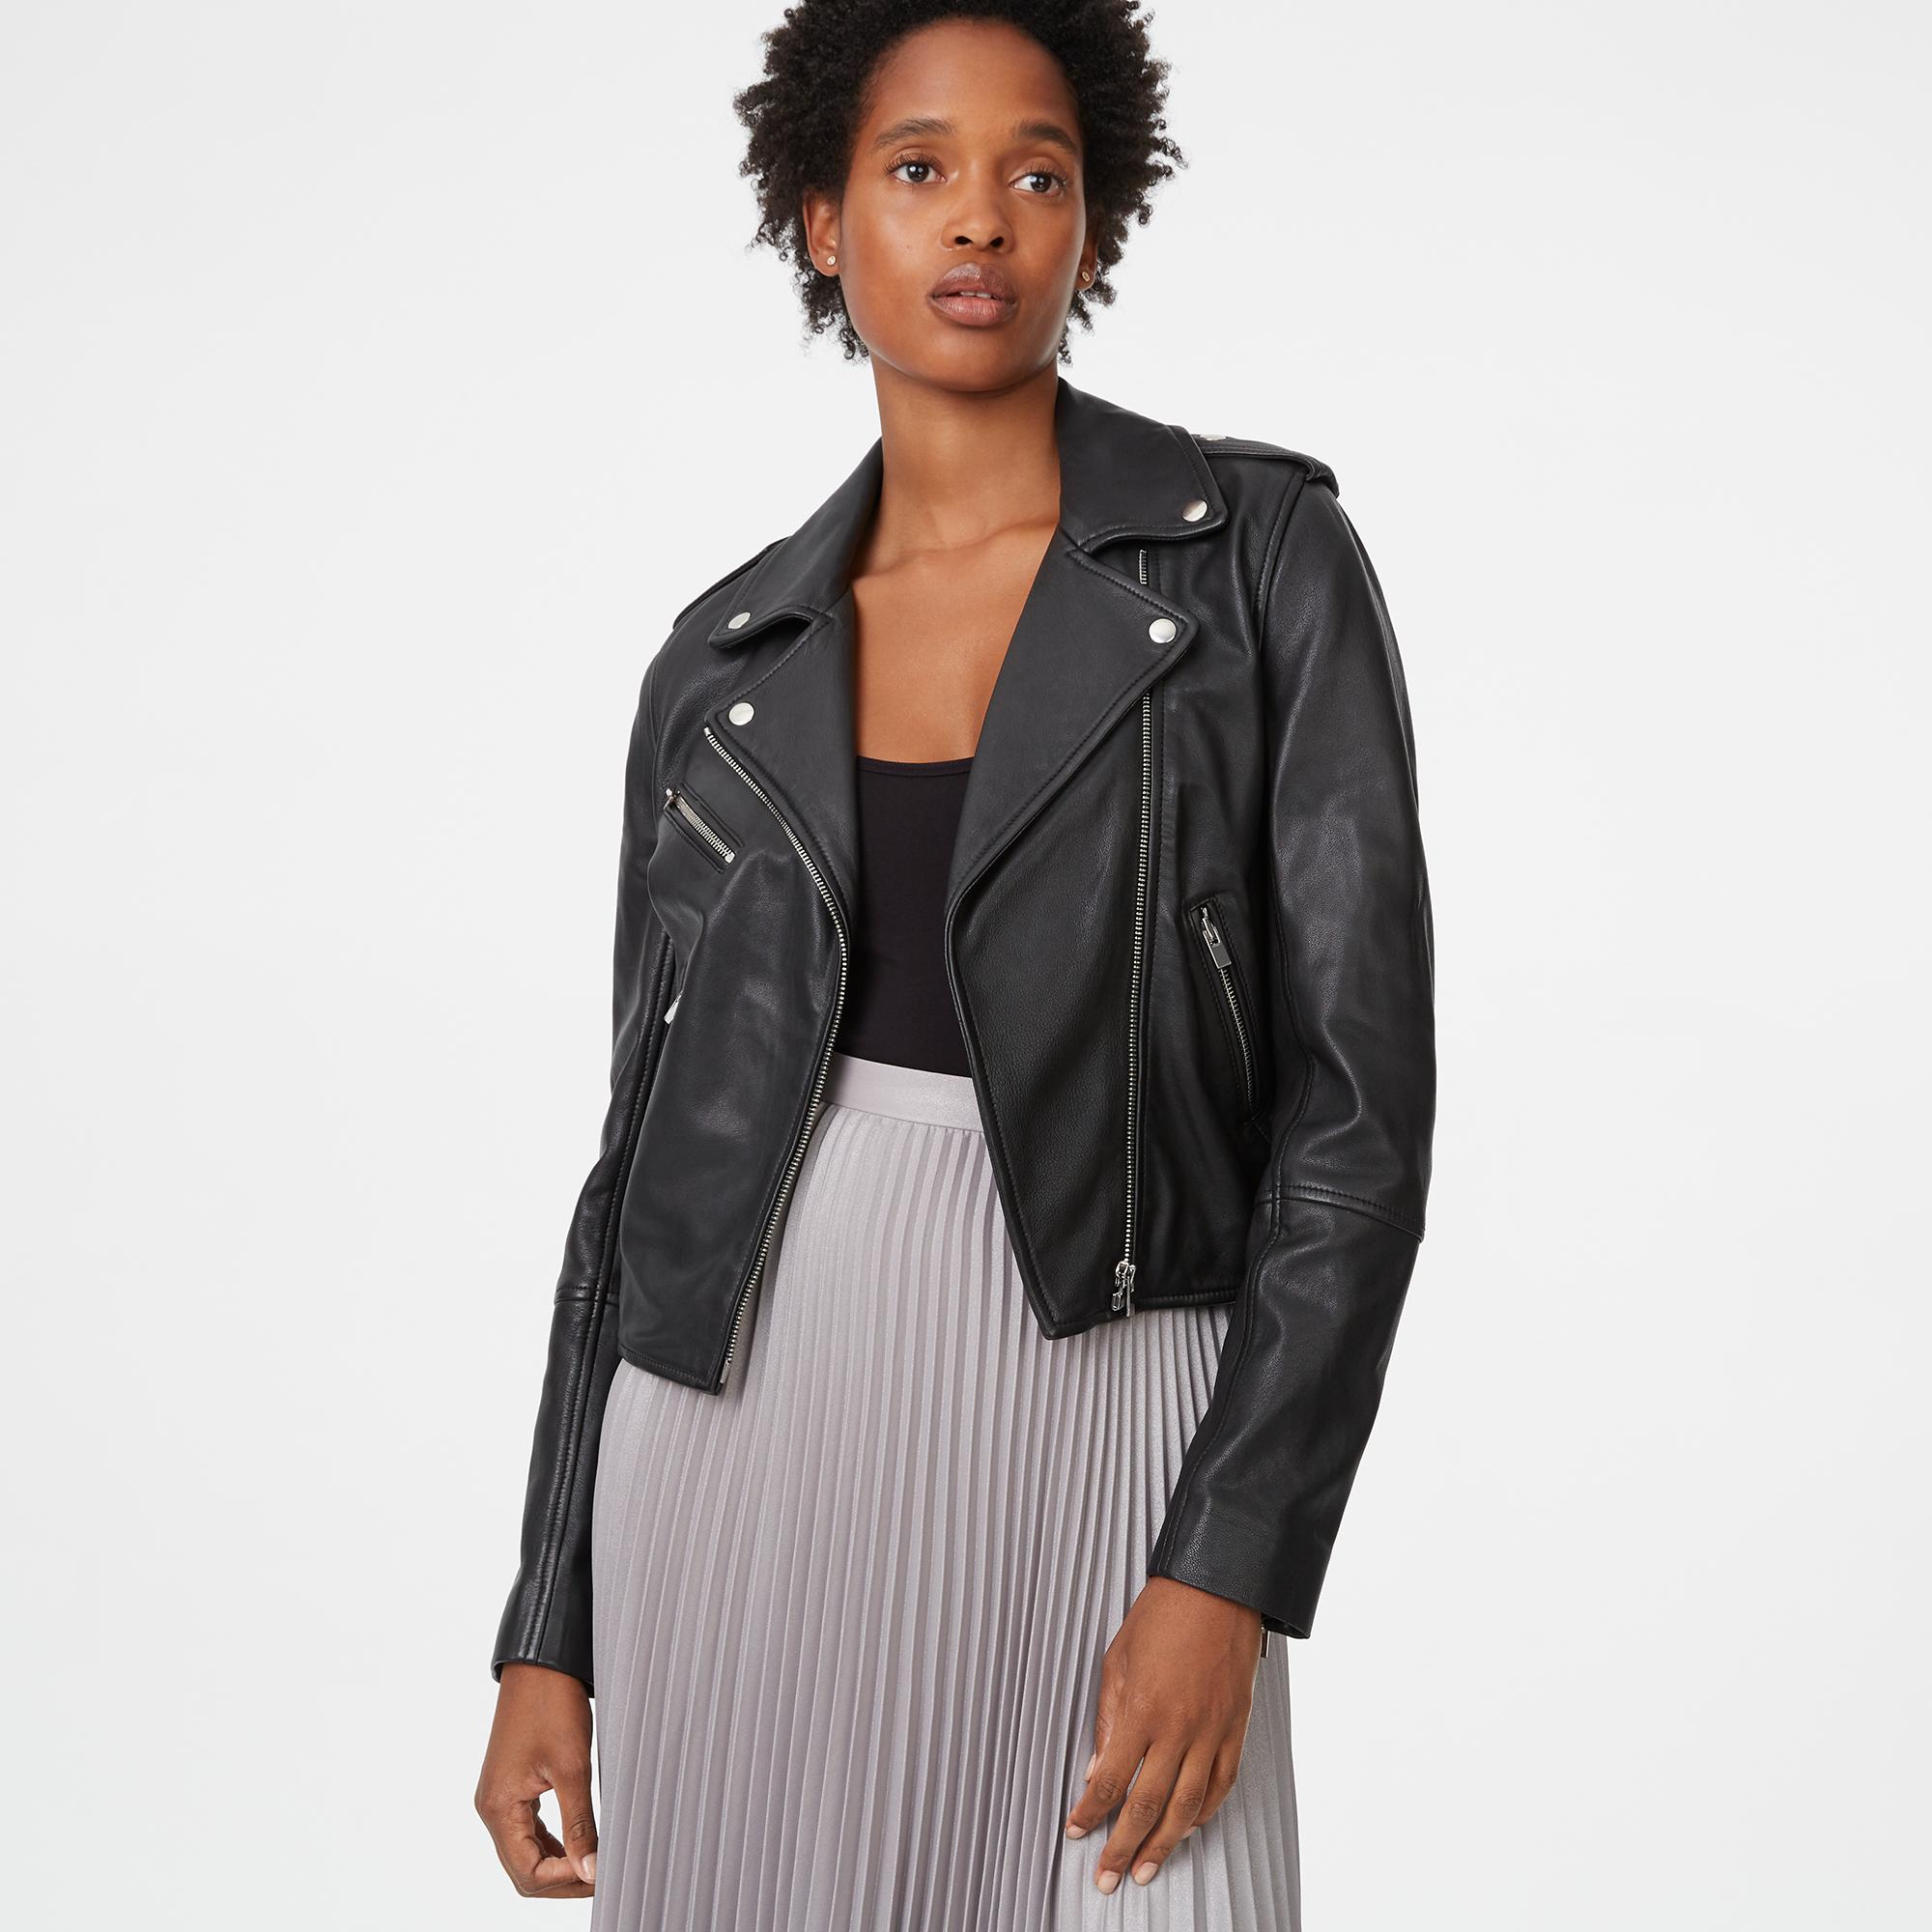 Gracella Leather Jacket